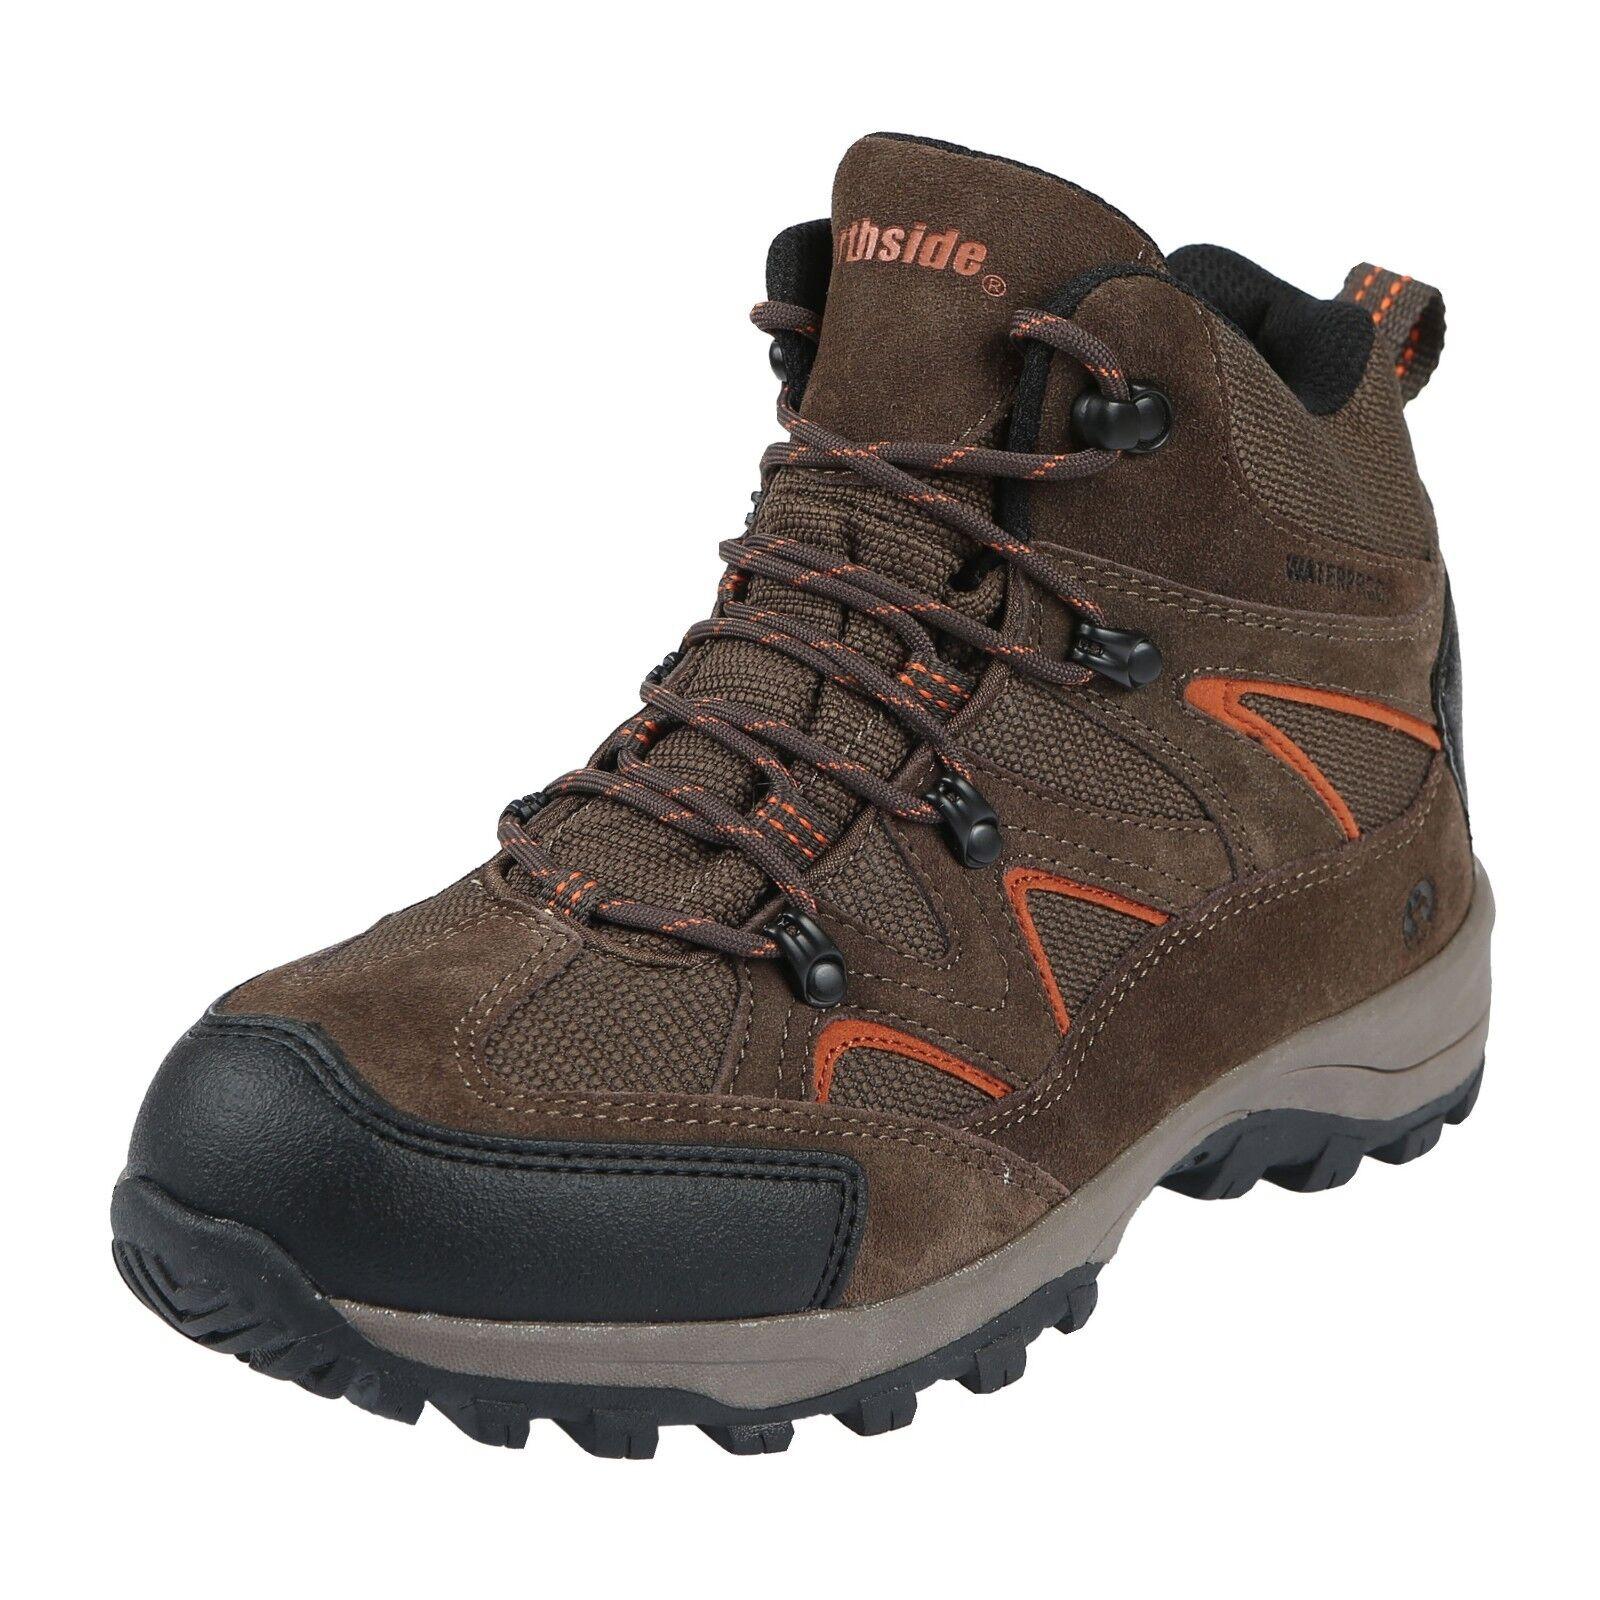 Northside Men's Snohomish Waterproof Hiking Boot